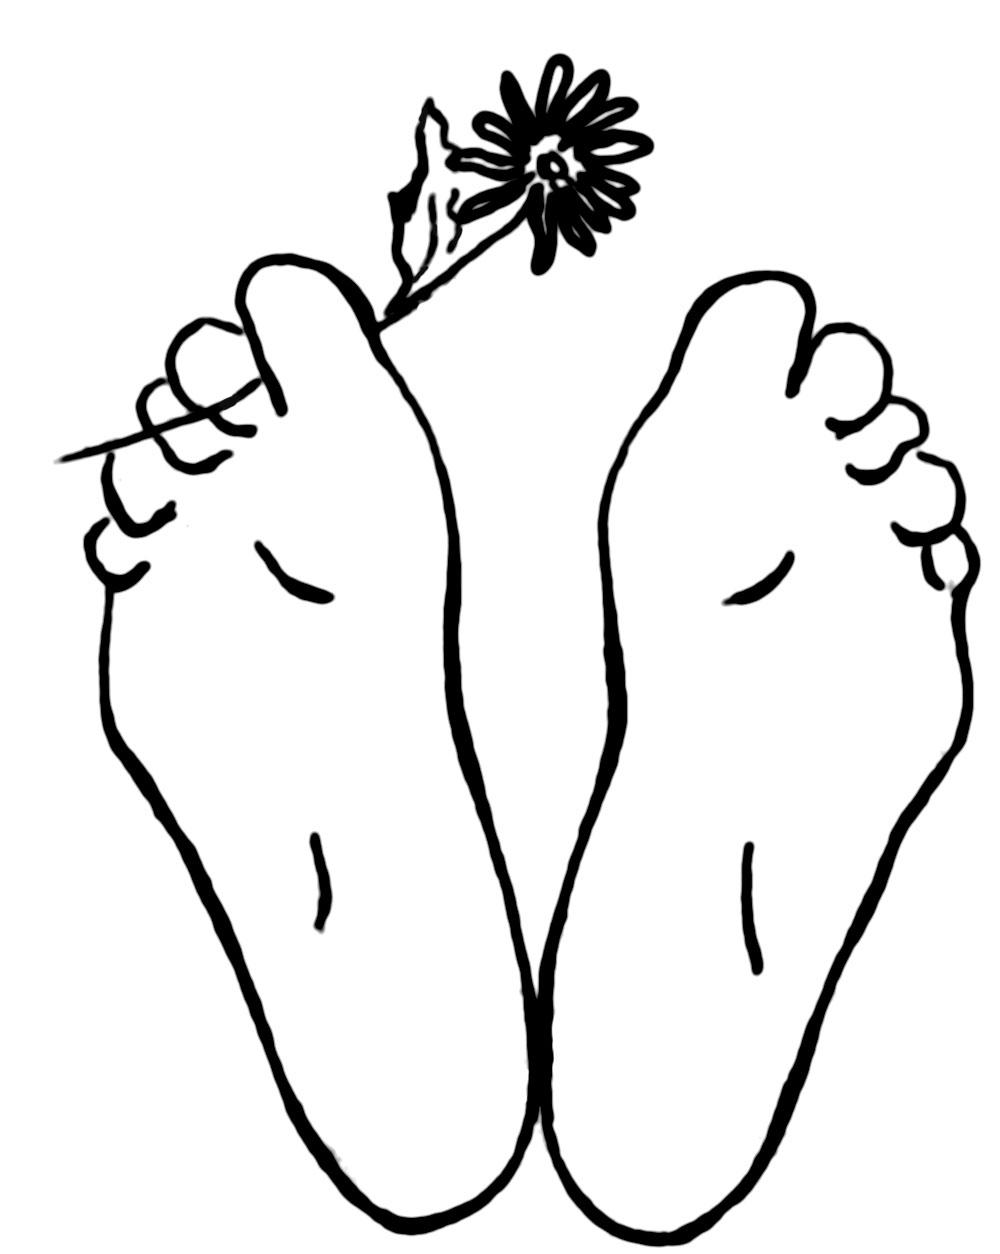 La Plante… des pieds